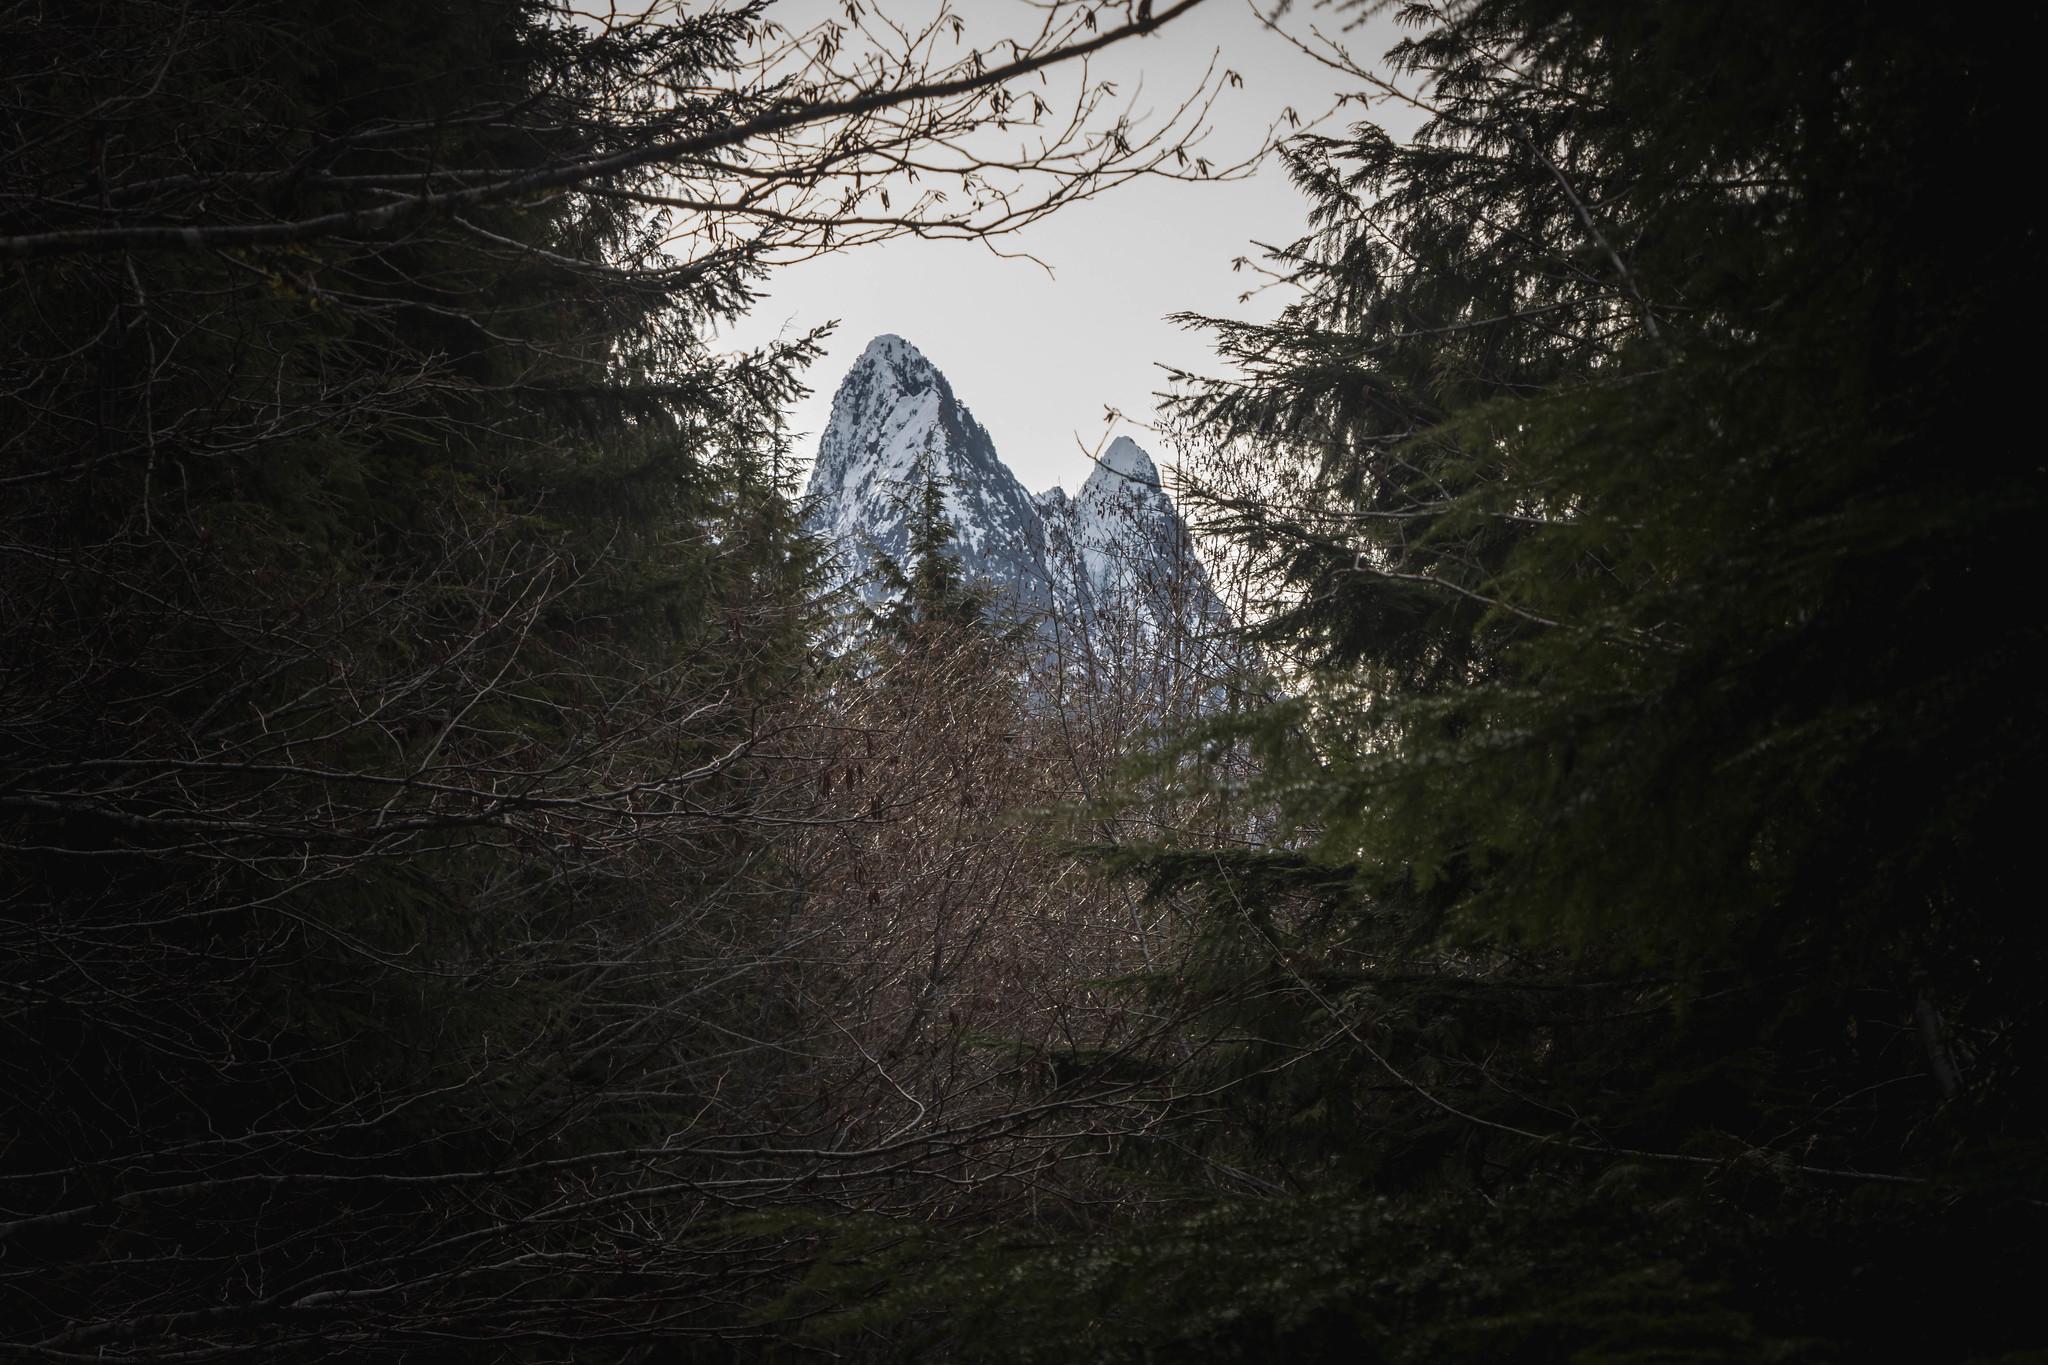 Garfield Mountain making a cameo